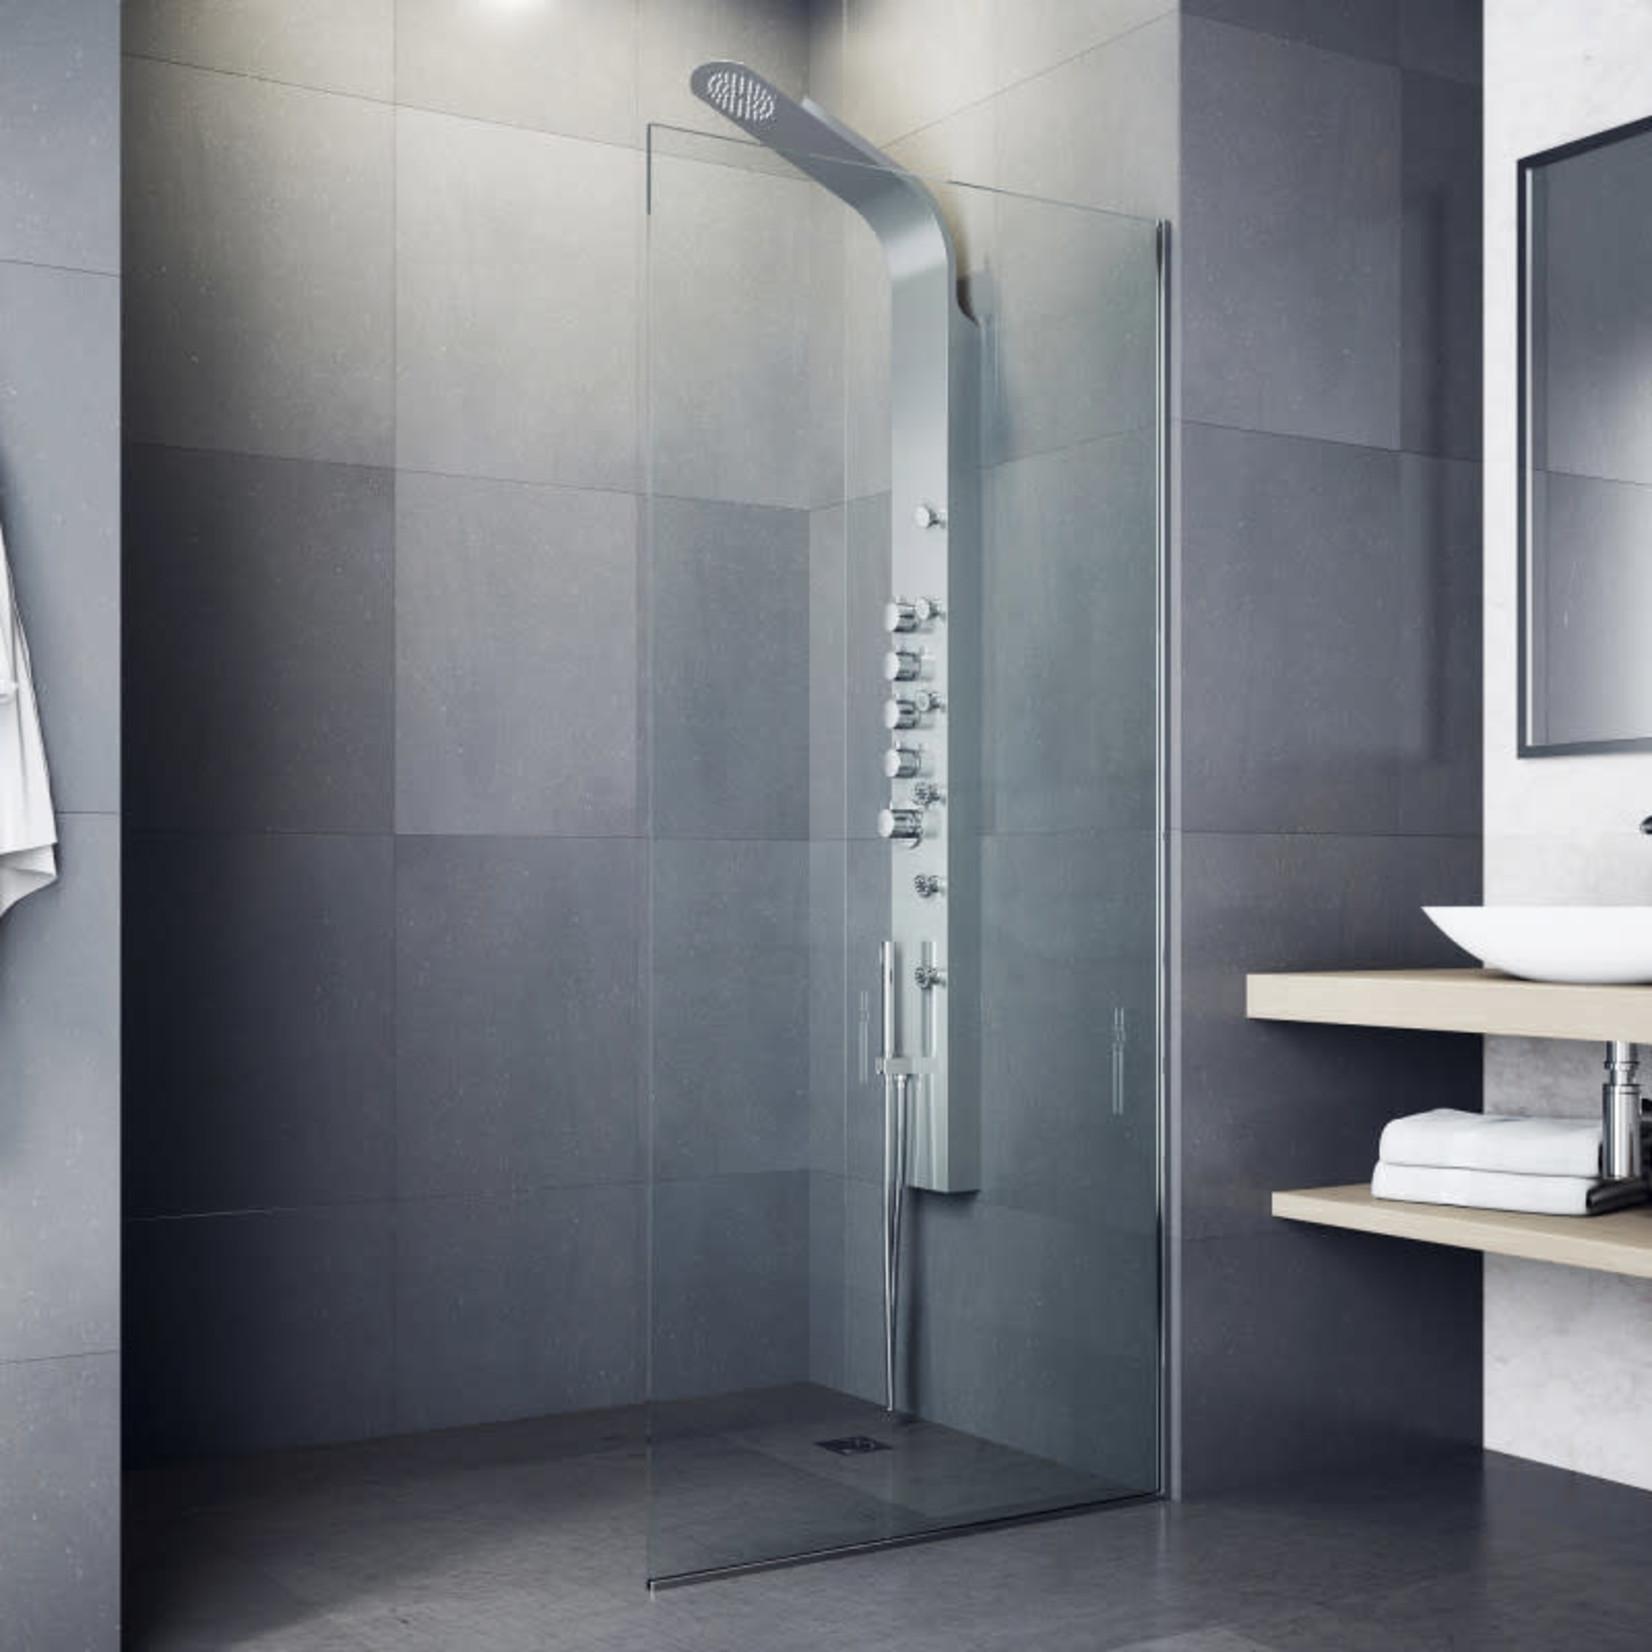 Vigo Brielle Shower Panel System with Rain Shower Head *Open box, new